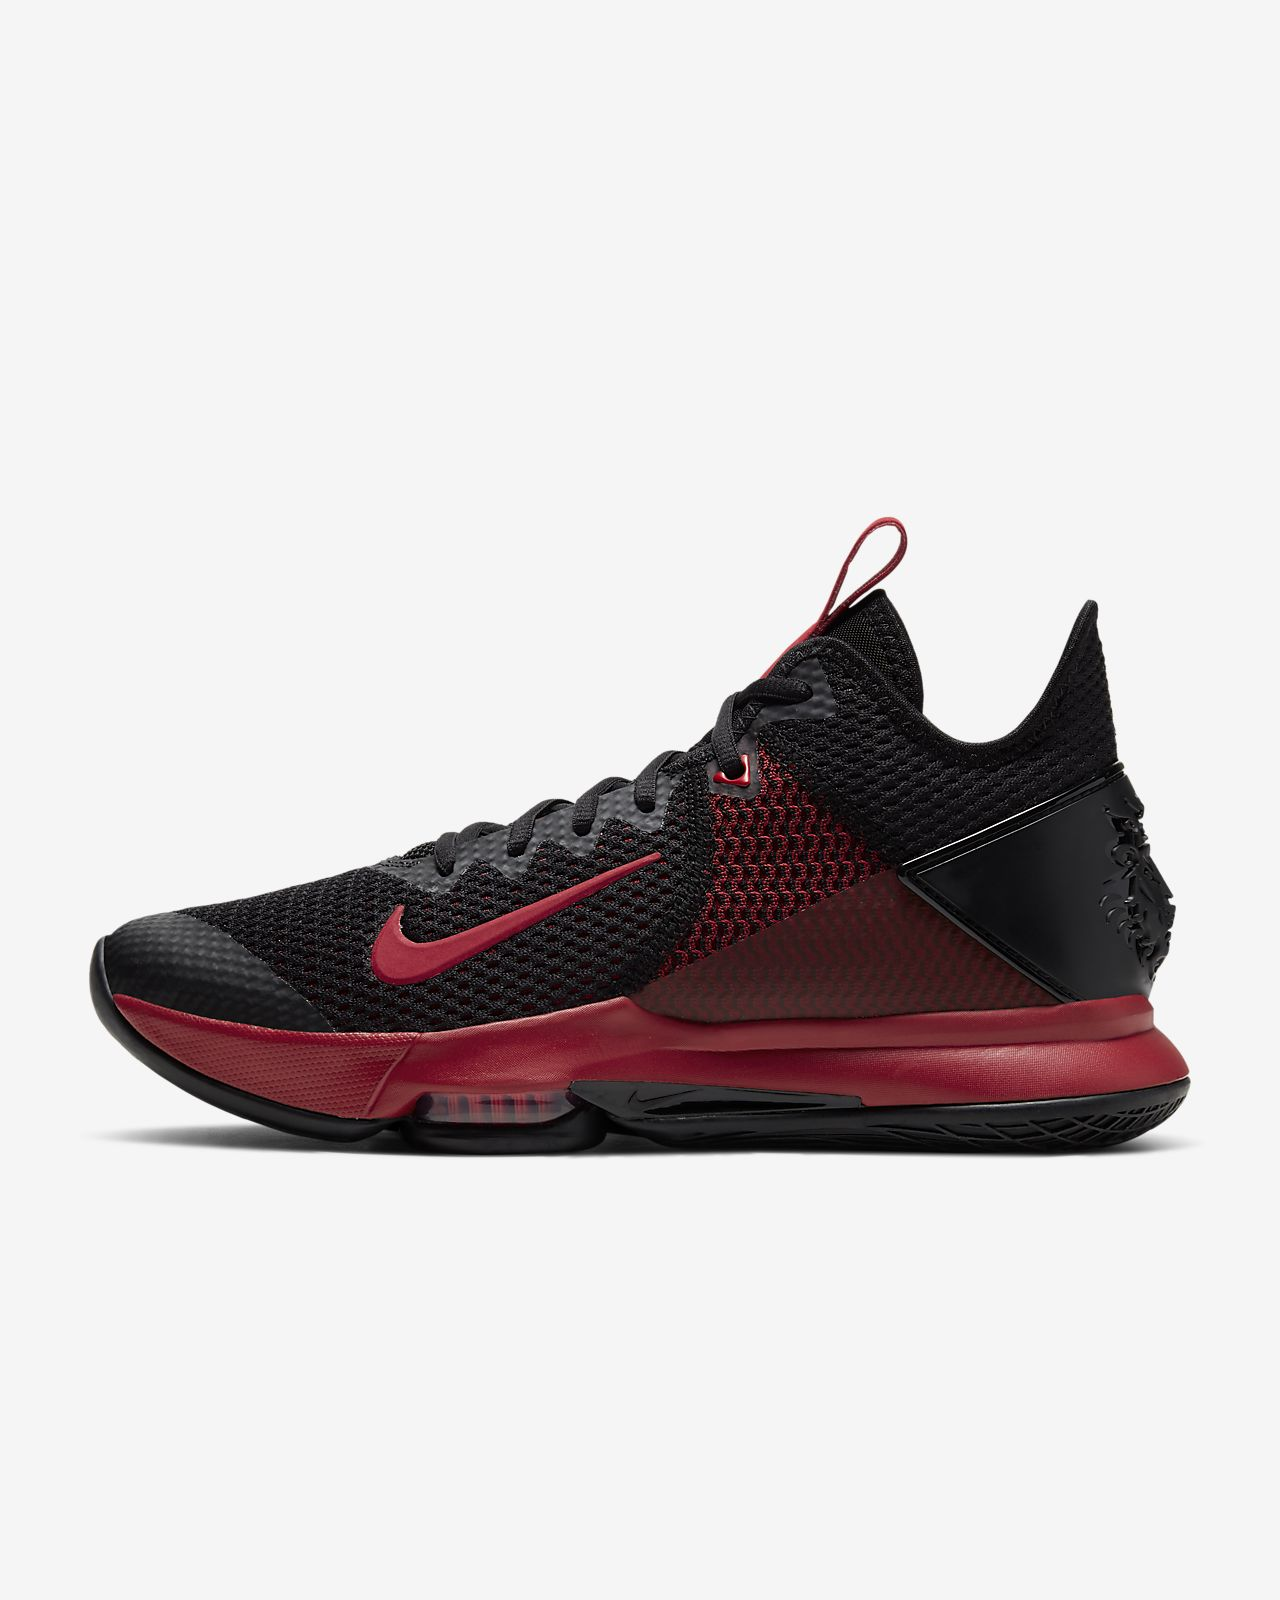 Nike LeBron Witness 3 BlackRed For Sale